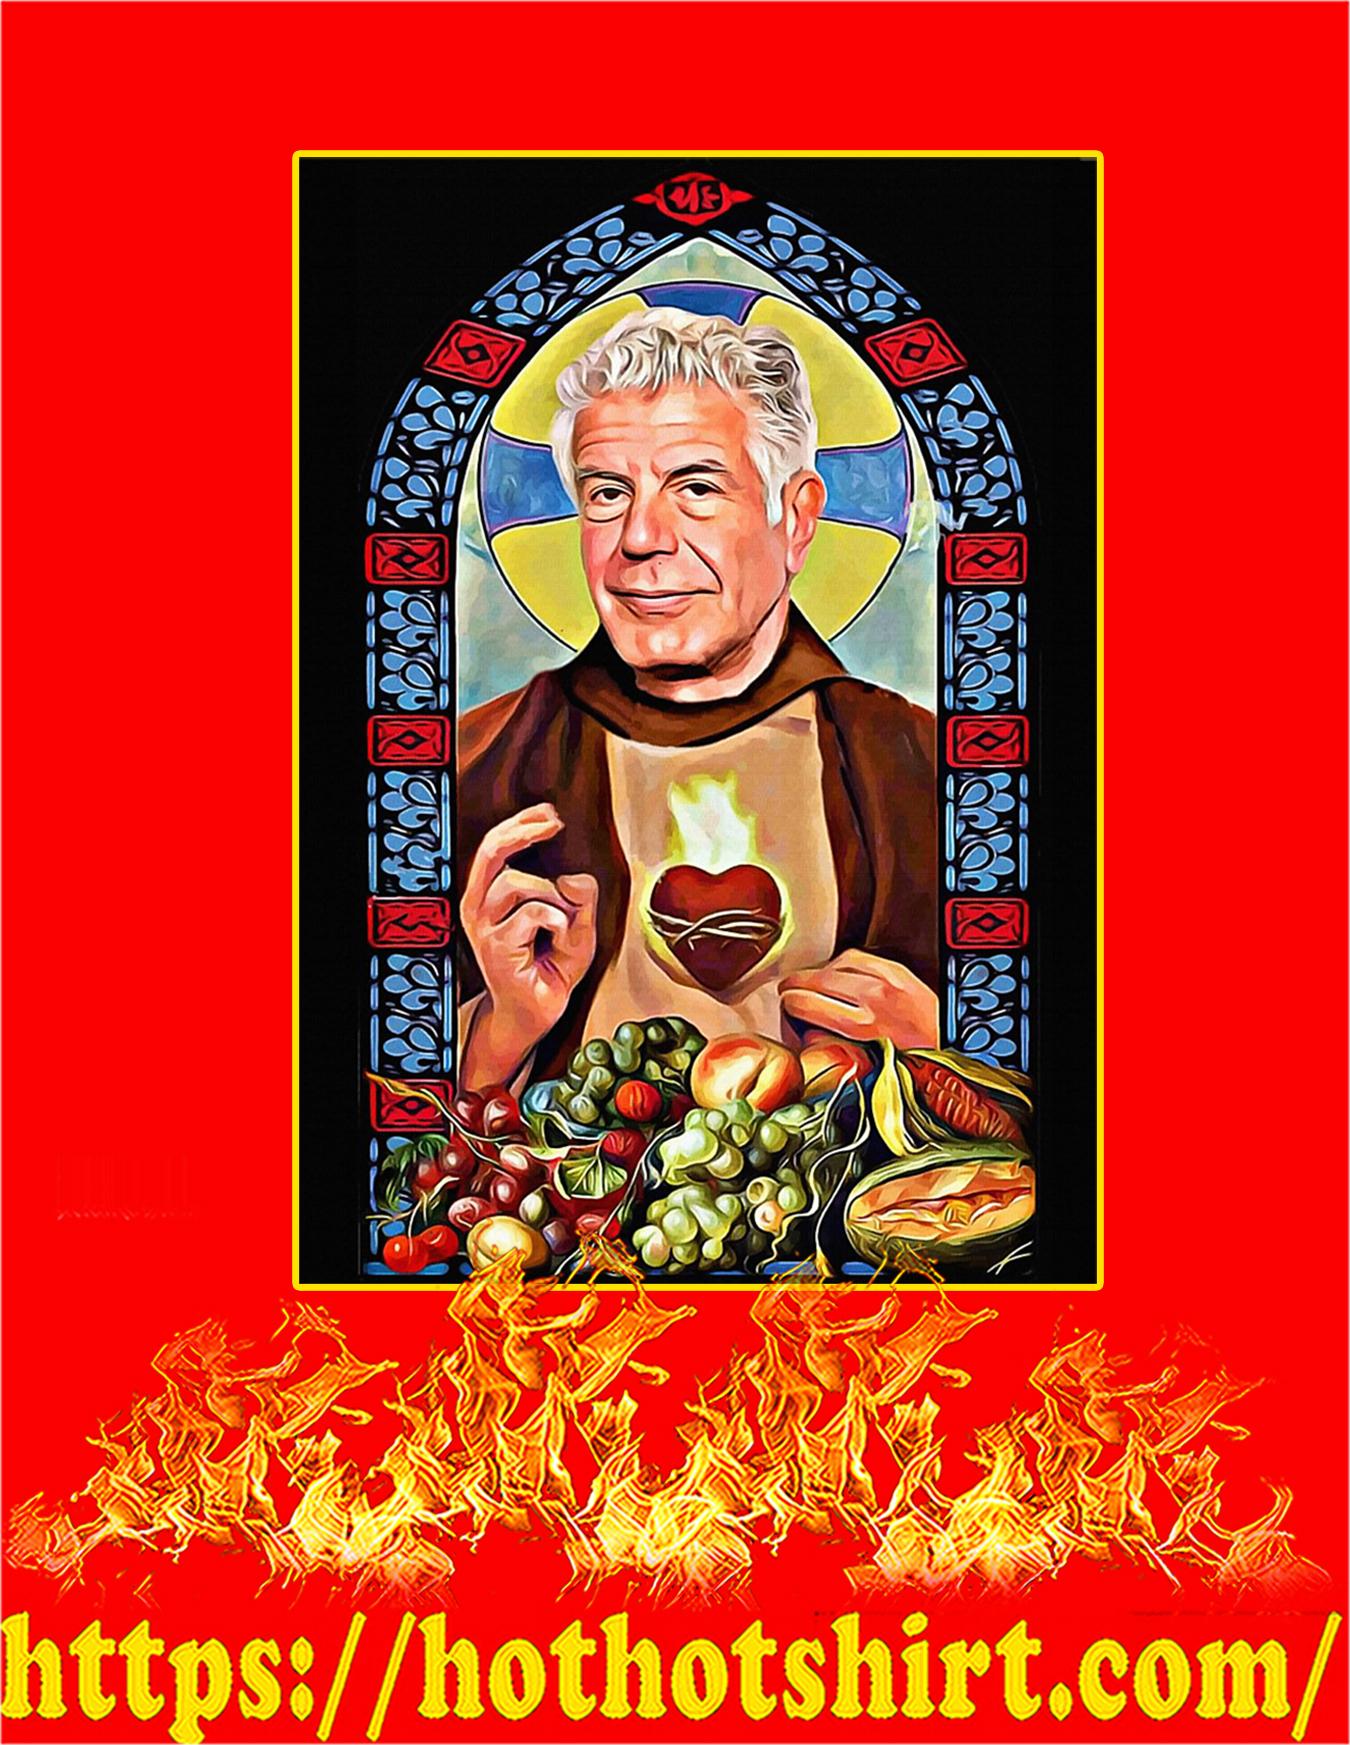 Patron saint of food and life prayer poster - A4